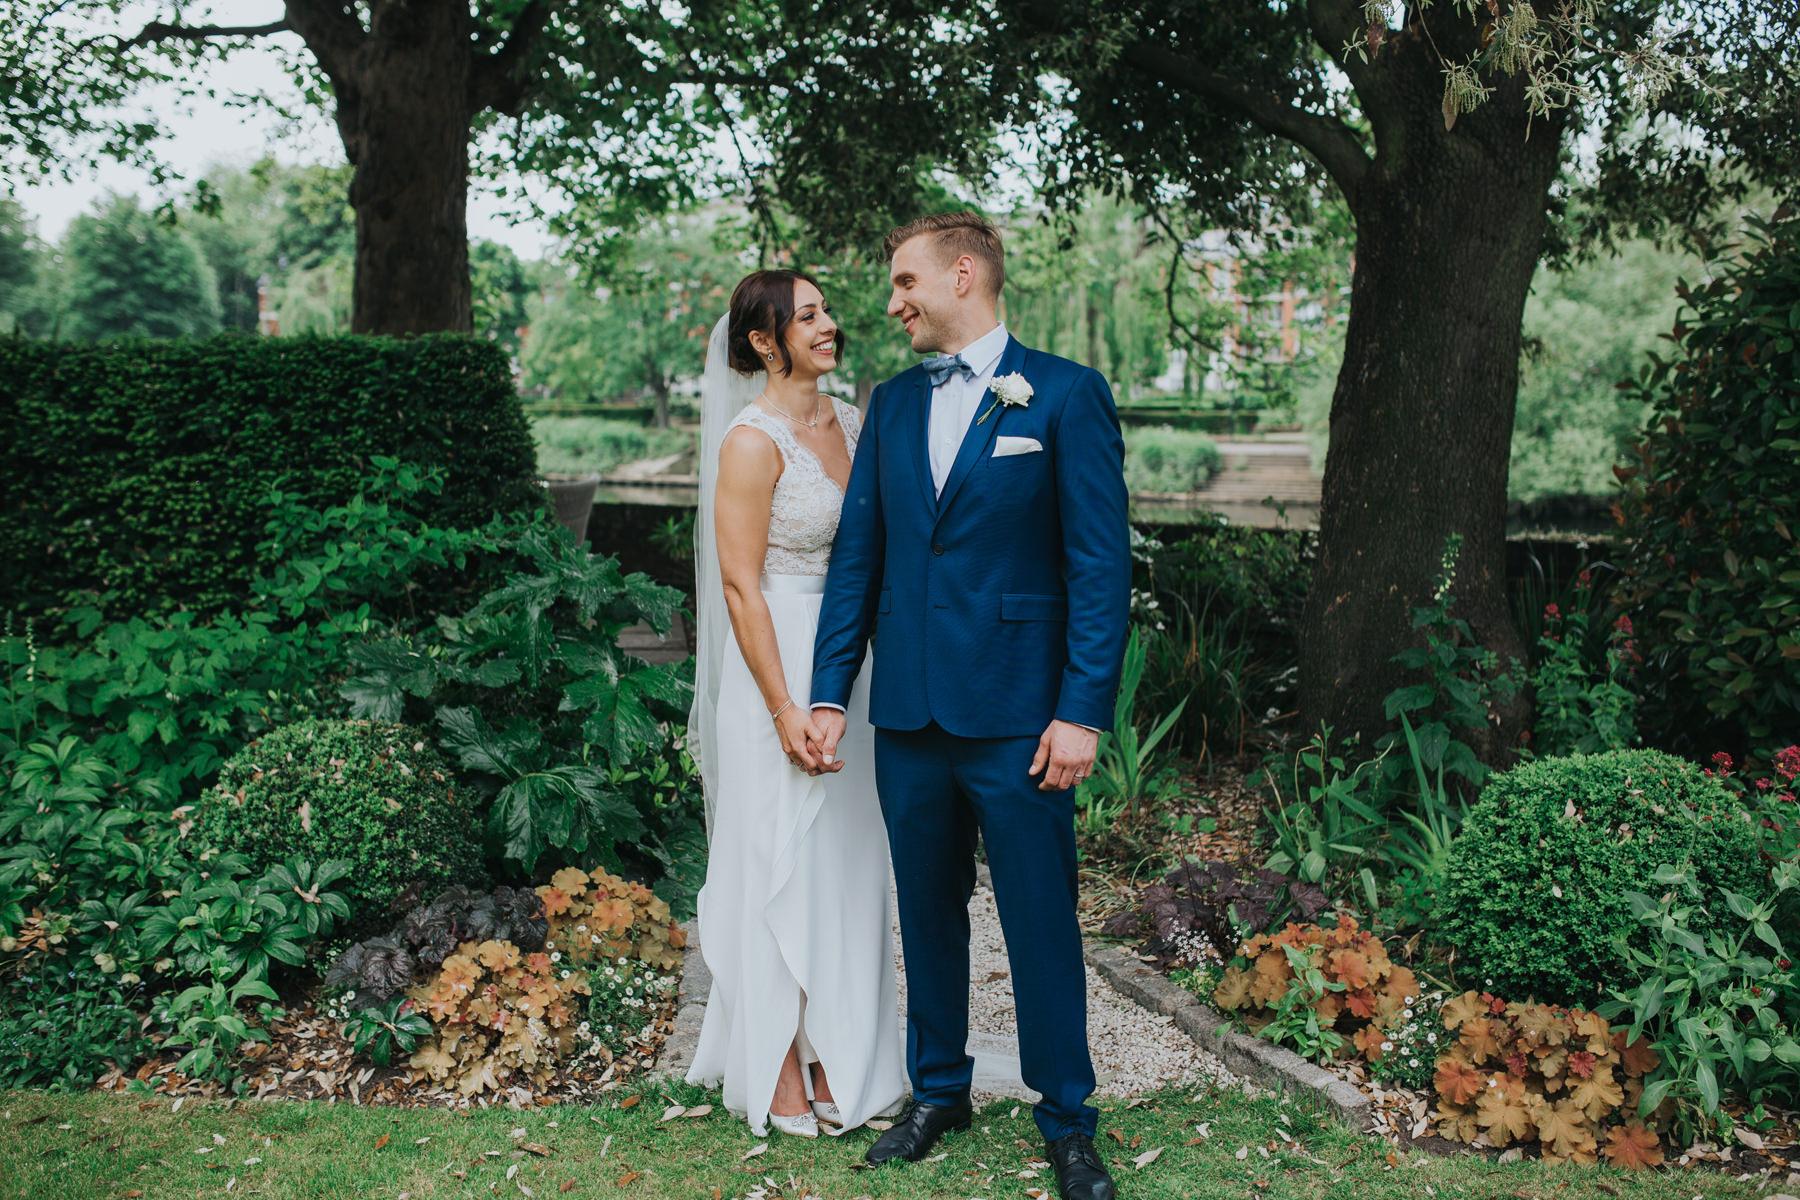 CRL-320-The Bingham wedding Richmond-Claire Rob bridal couple portraits.jpg